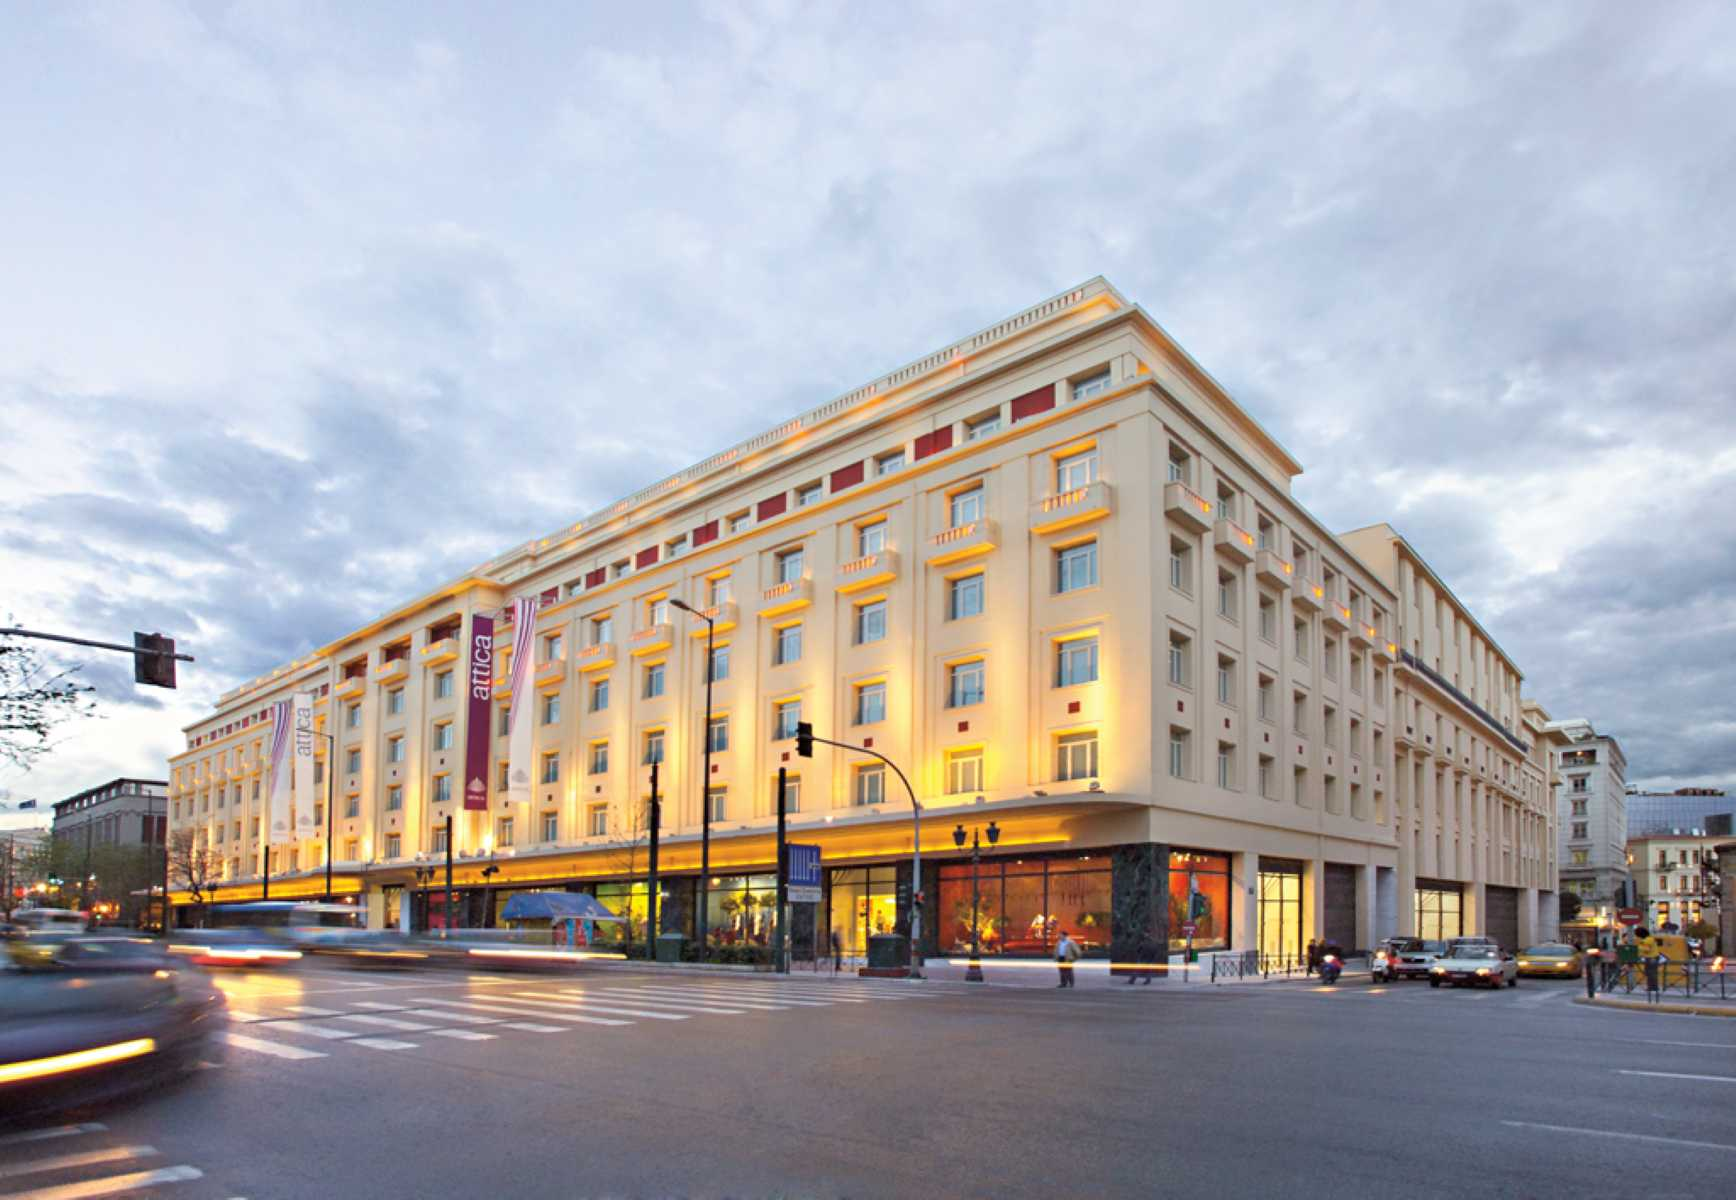 attica City Link: Επενδύσεις 8 εκατ. ευρώ και 250 νέες θέσεις εργασίας